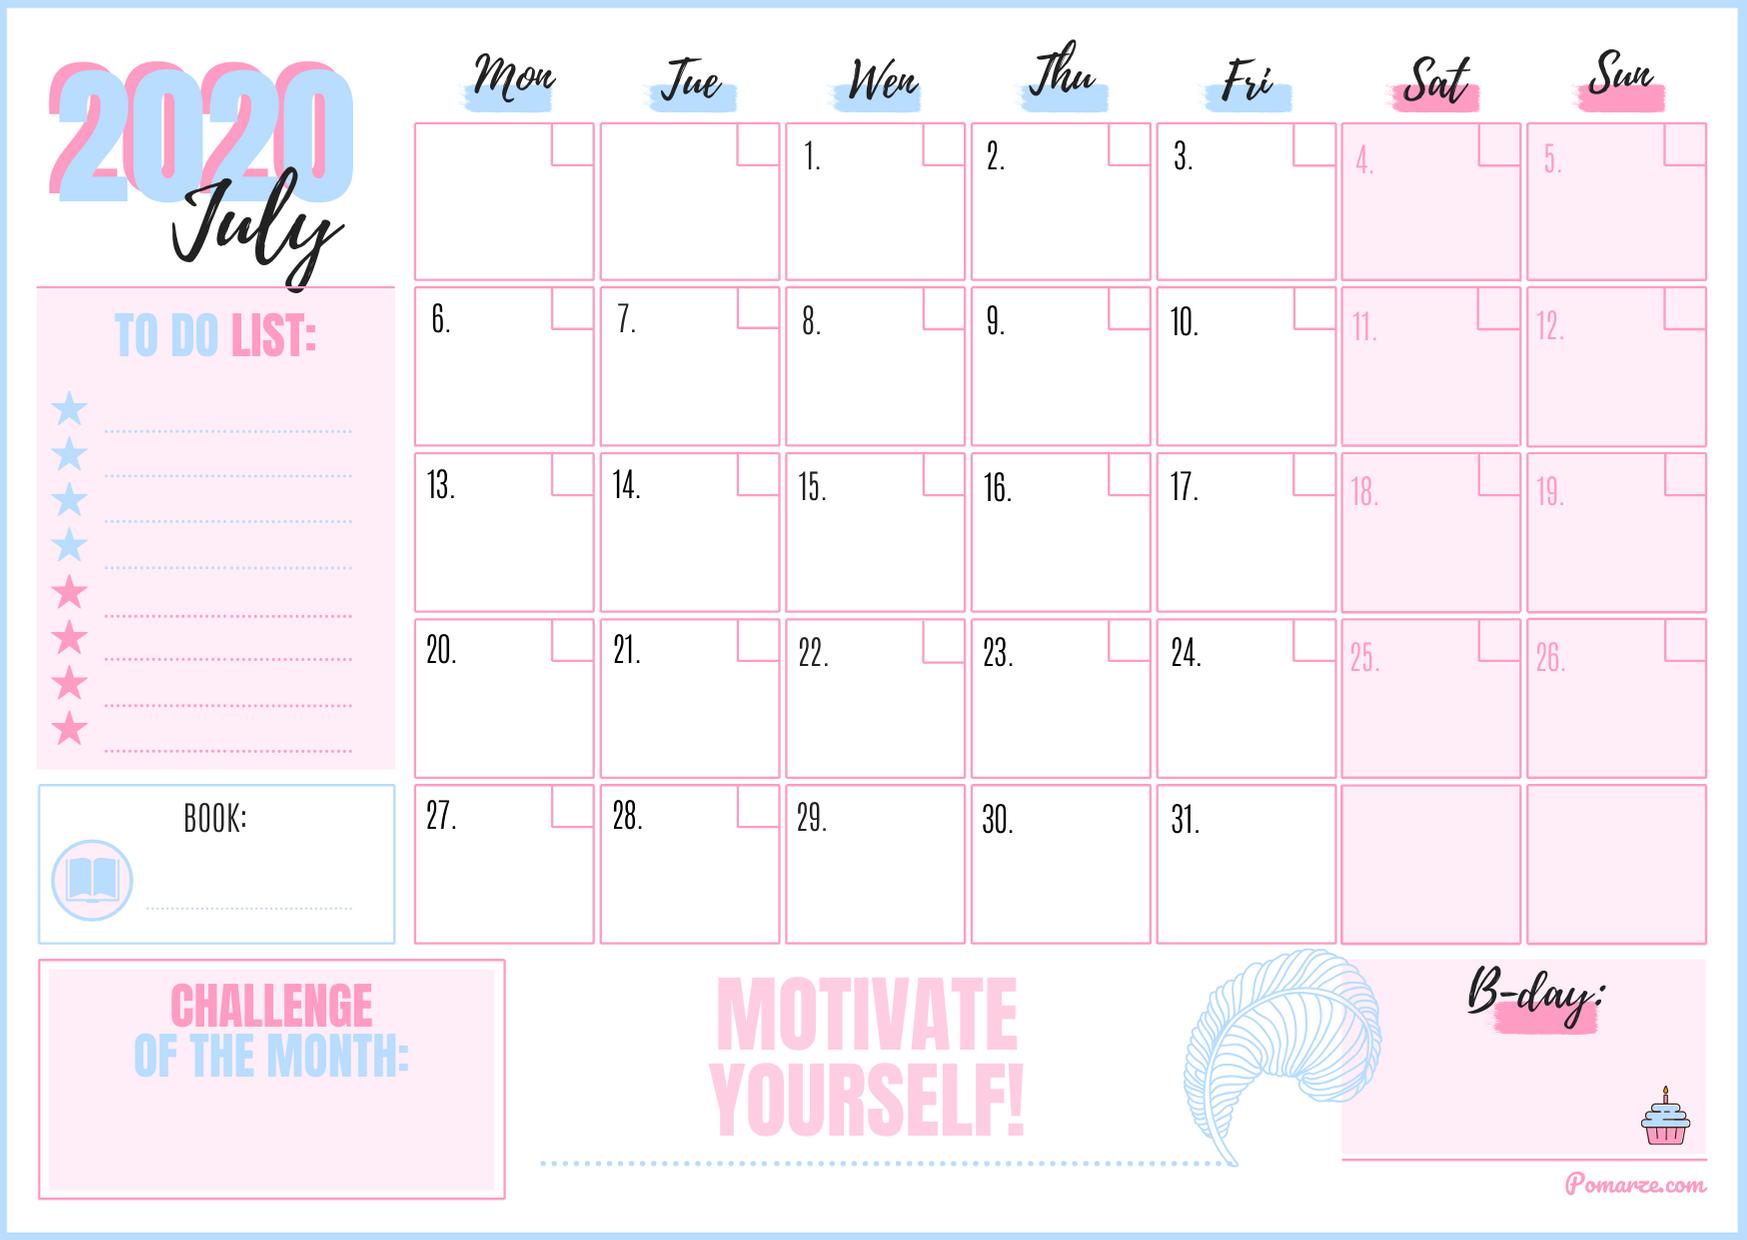 Monthly Calendar Planner July 2020